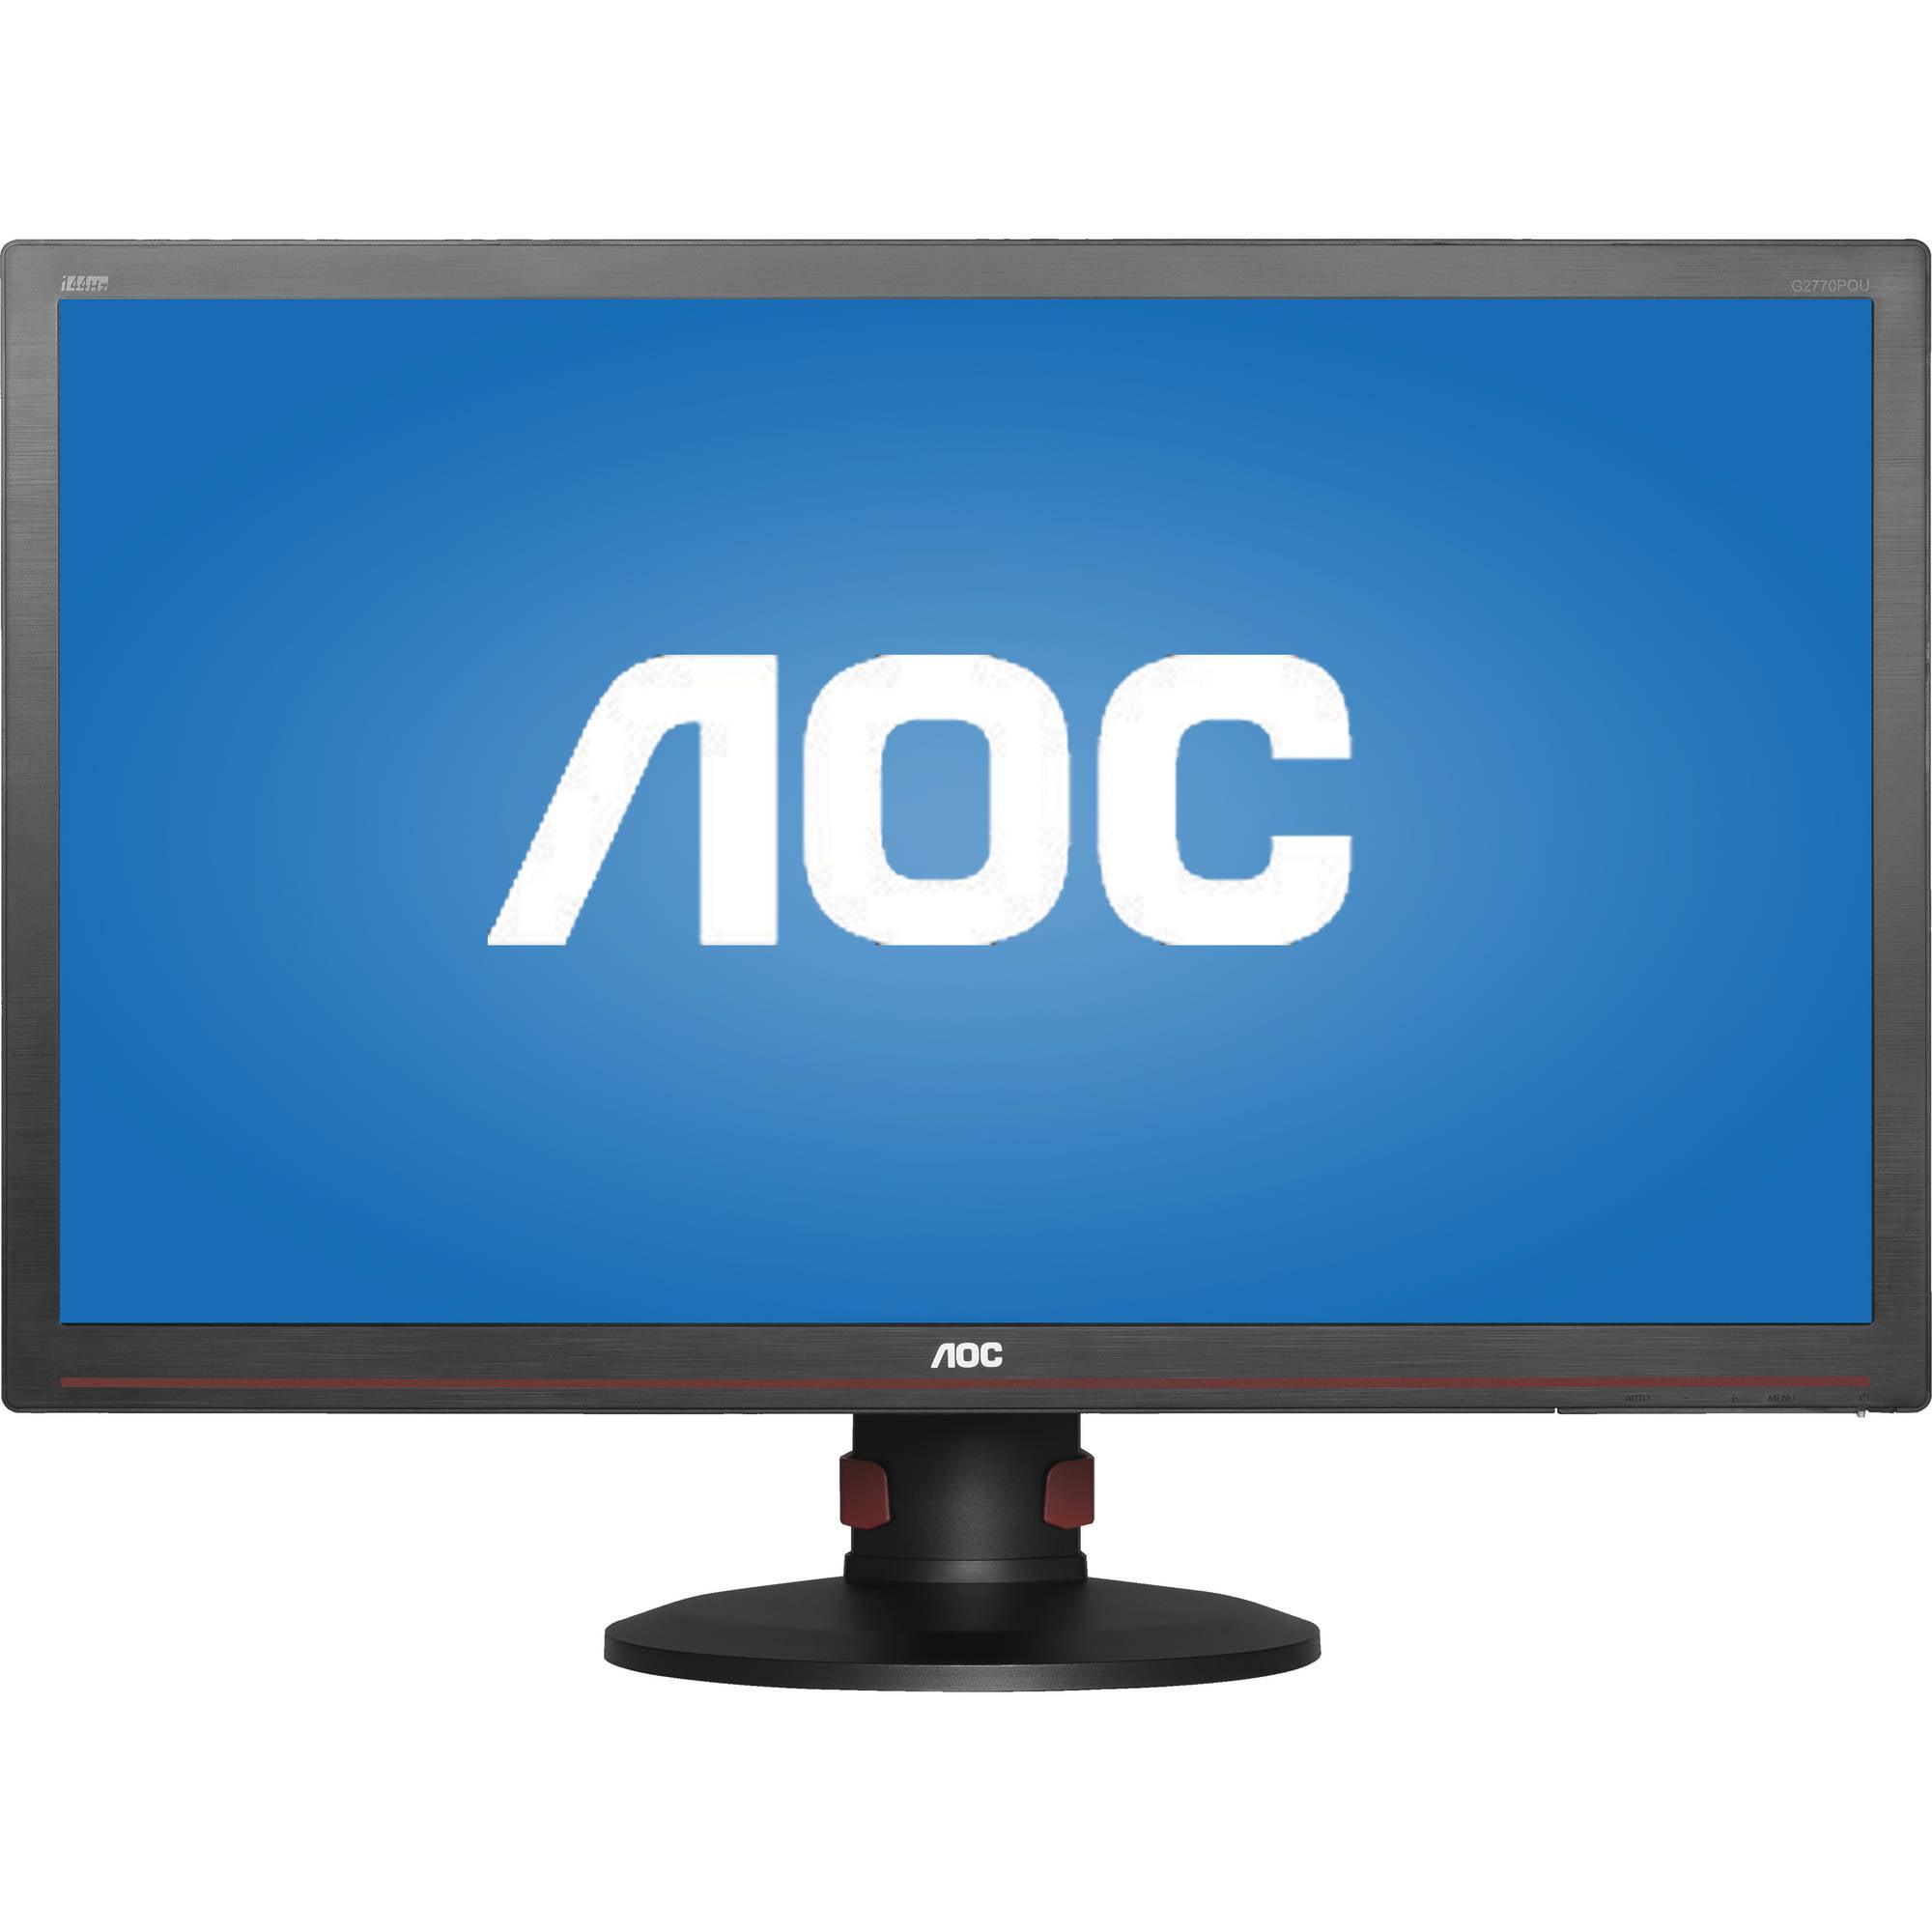 "AOC Gaming Monitor 27"" Class Full HD 1920x1080 1ms 144Hz VGA DVI-D HDMI"